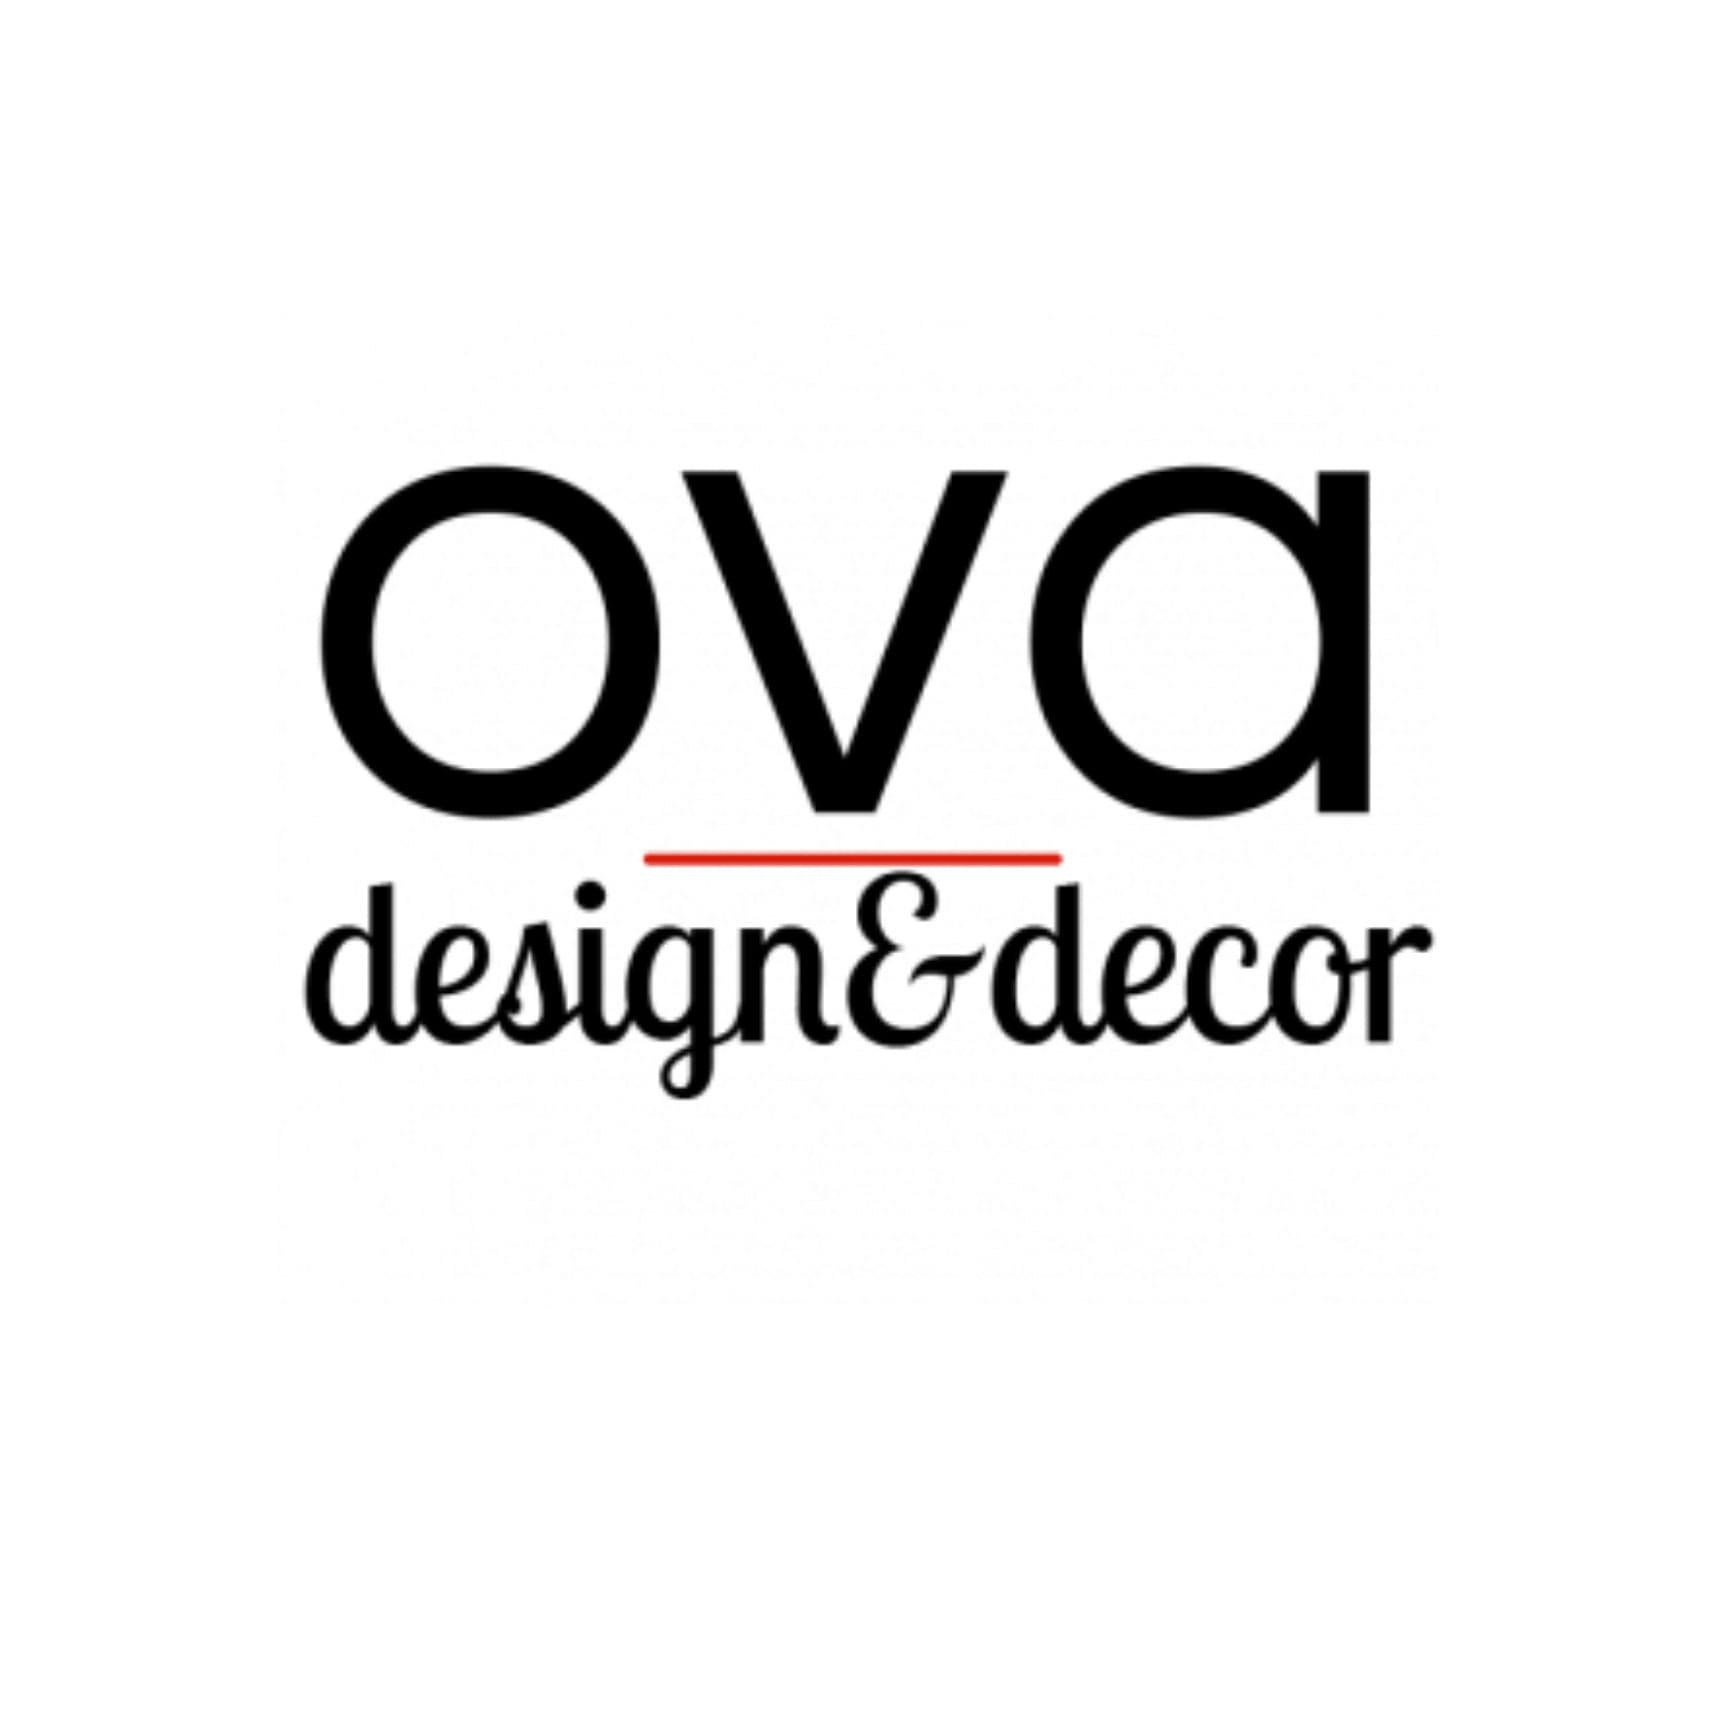 OVA Design & Decor - Houston Floral